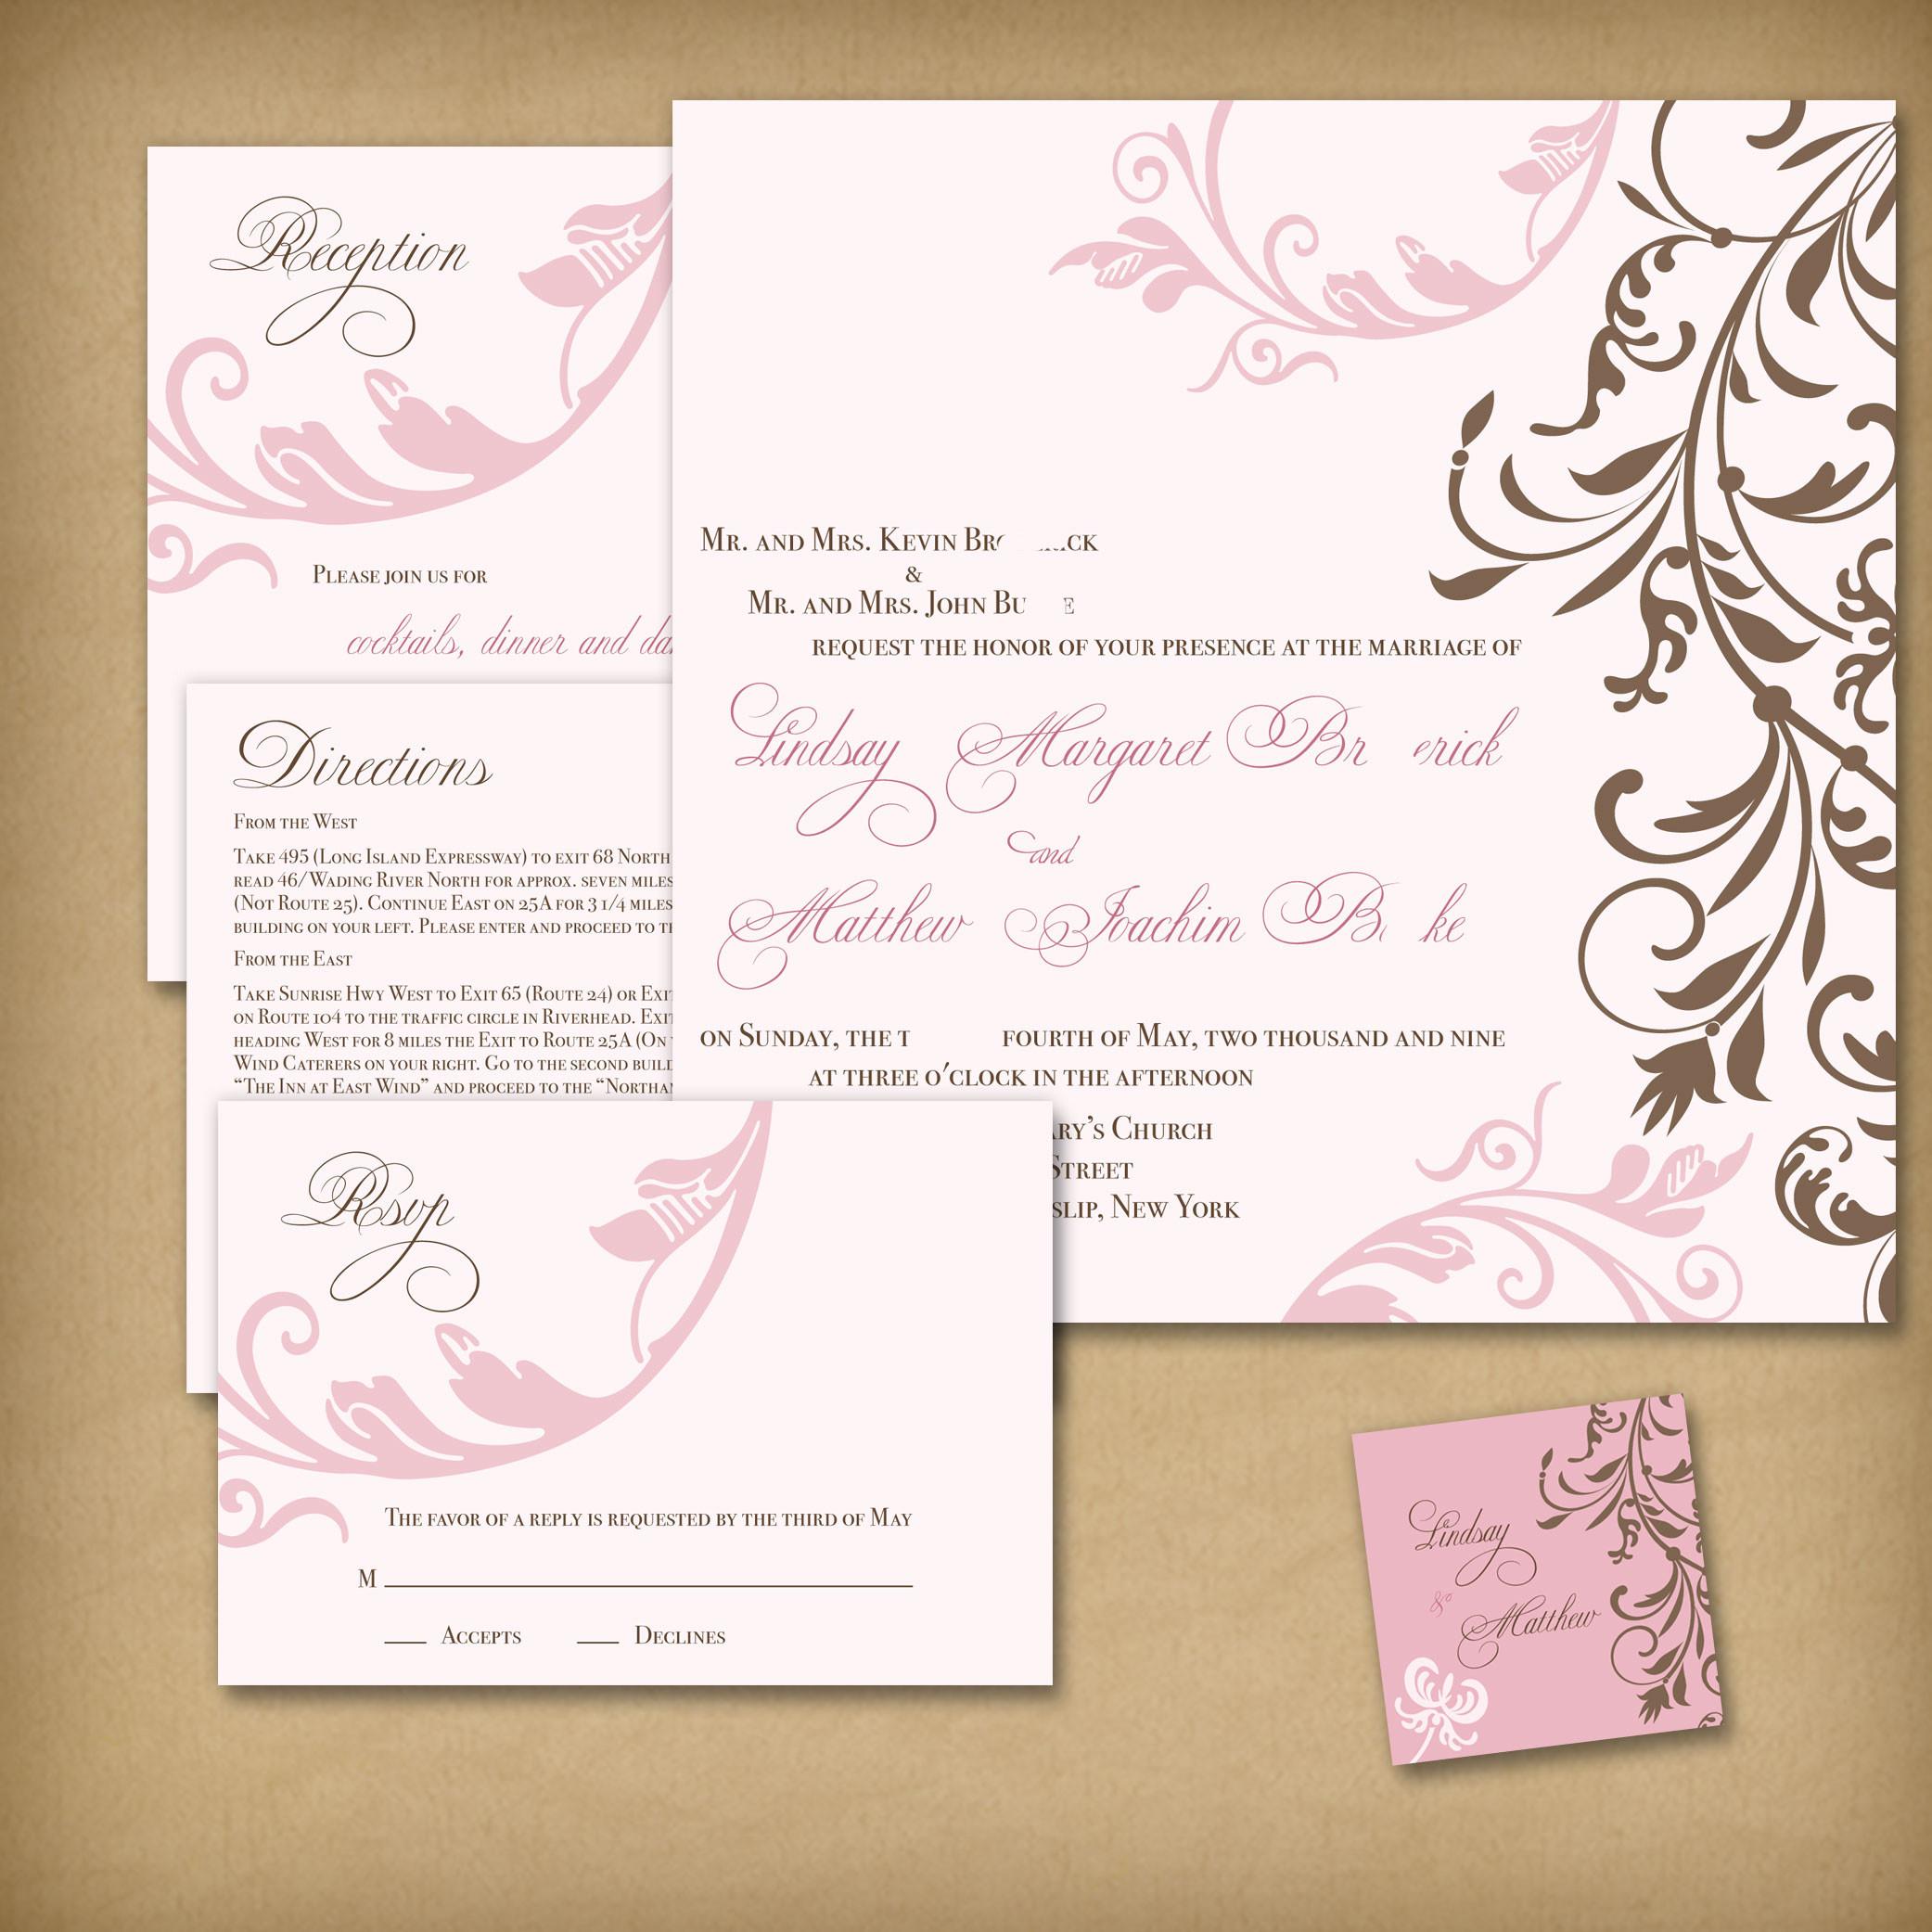 Wedding Email Invitations  Free Wedding Email Invitations Wedding Invitation Collection